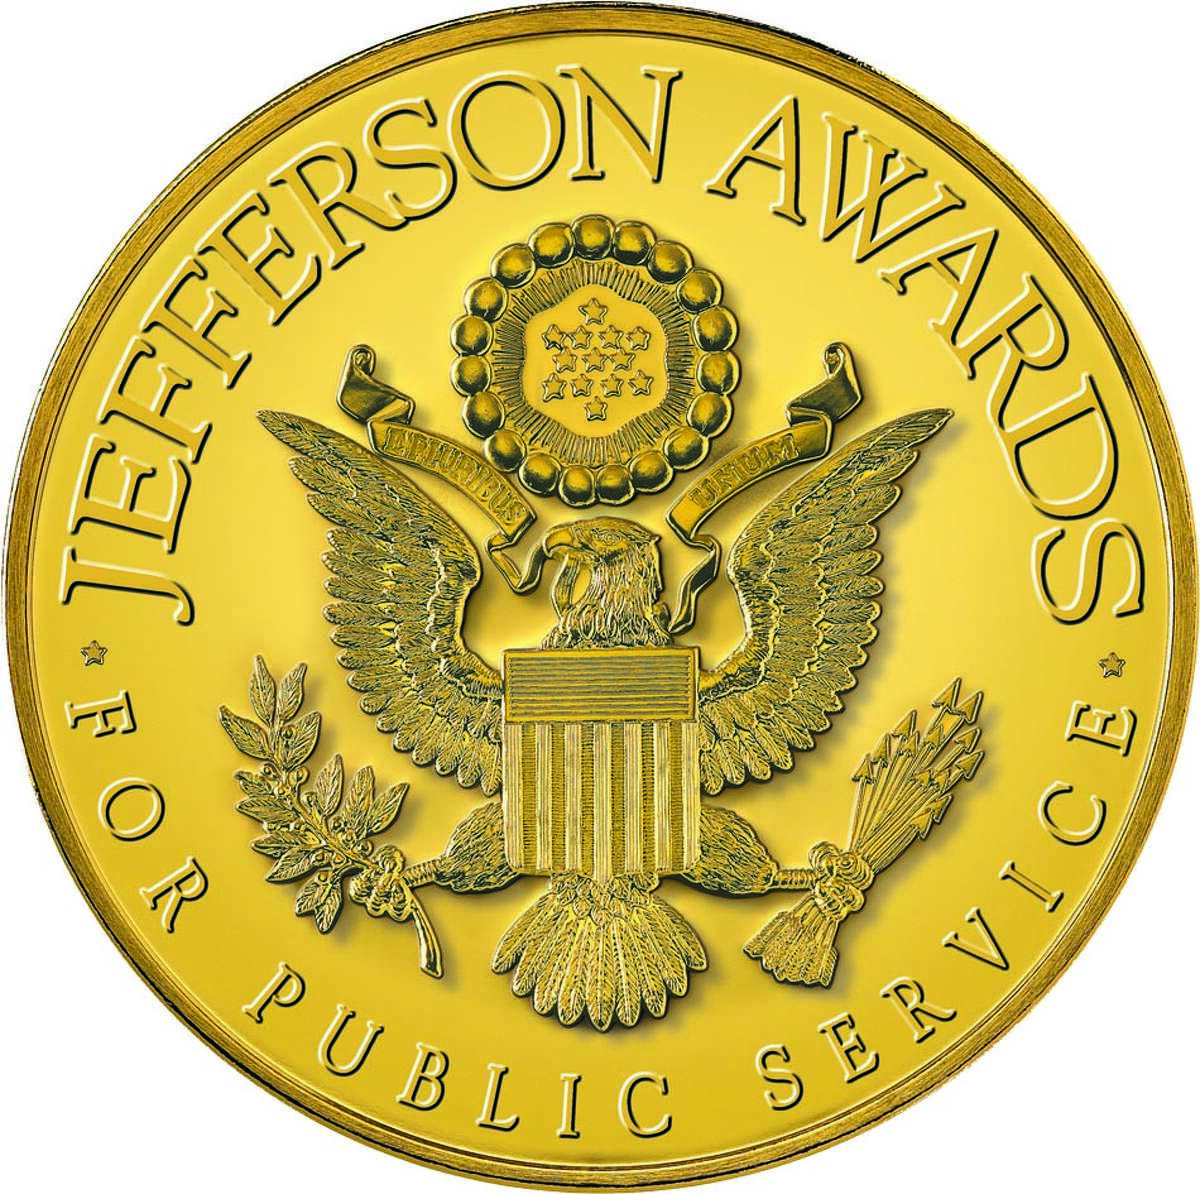 Jefferson Awards medal